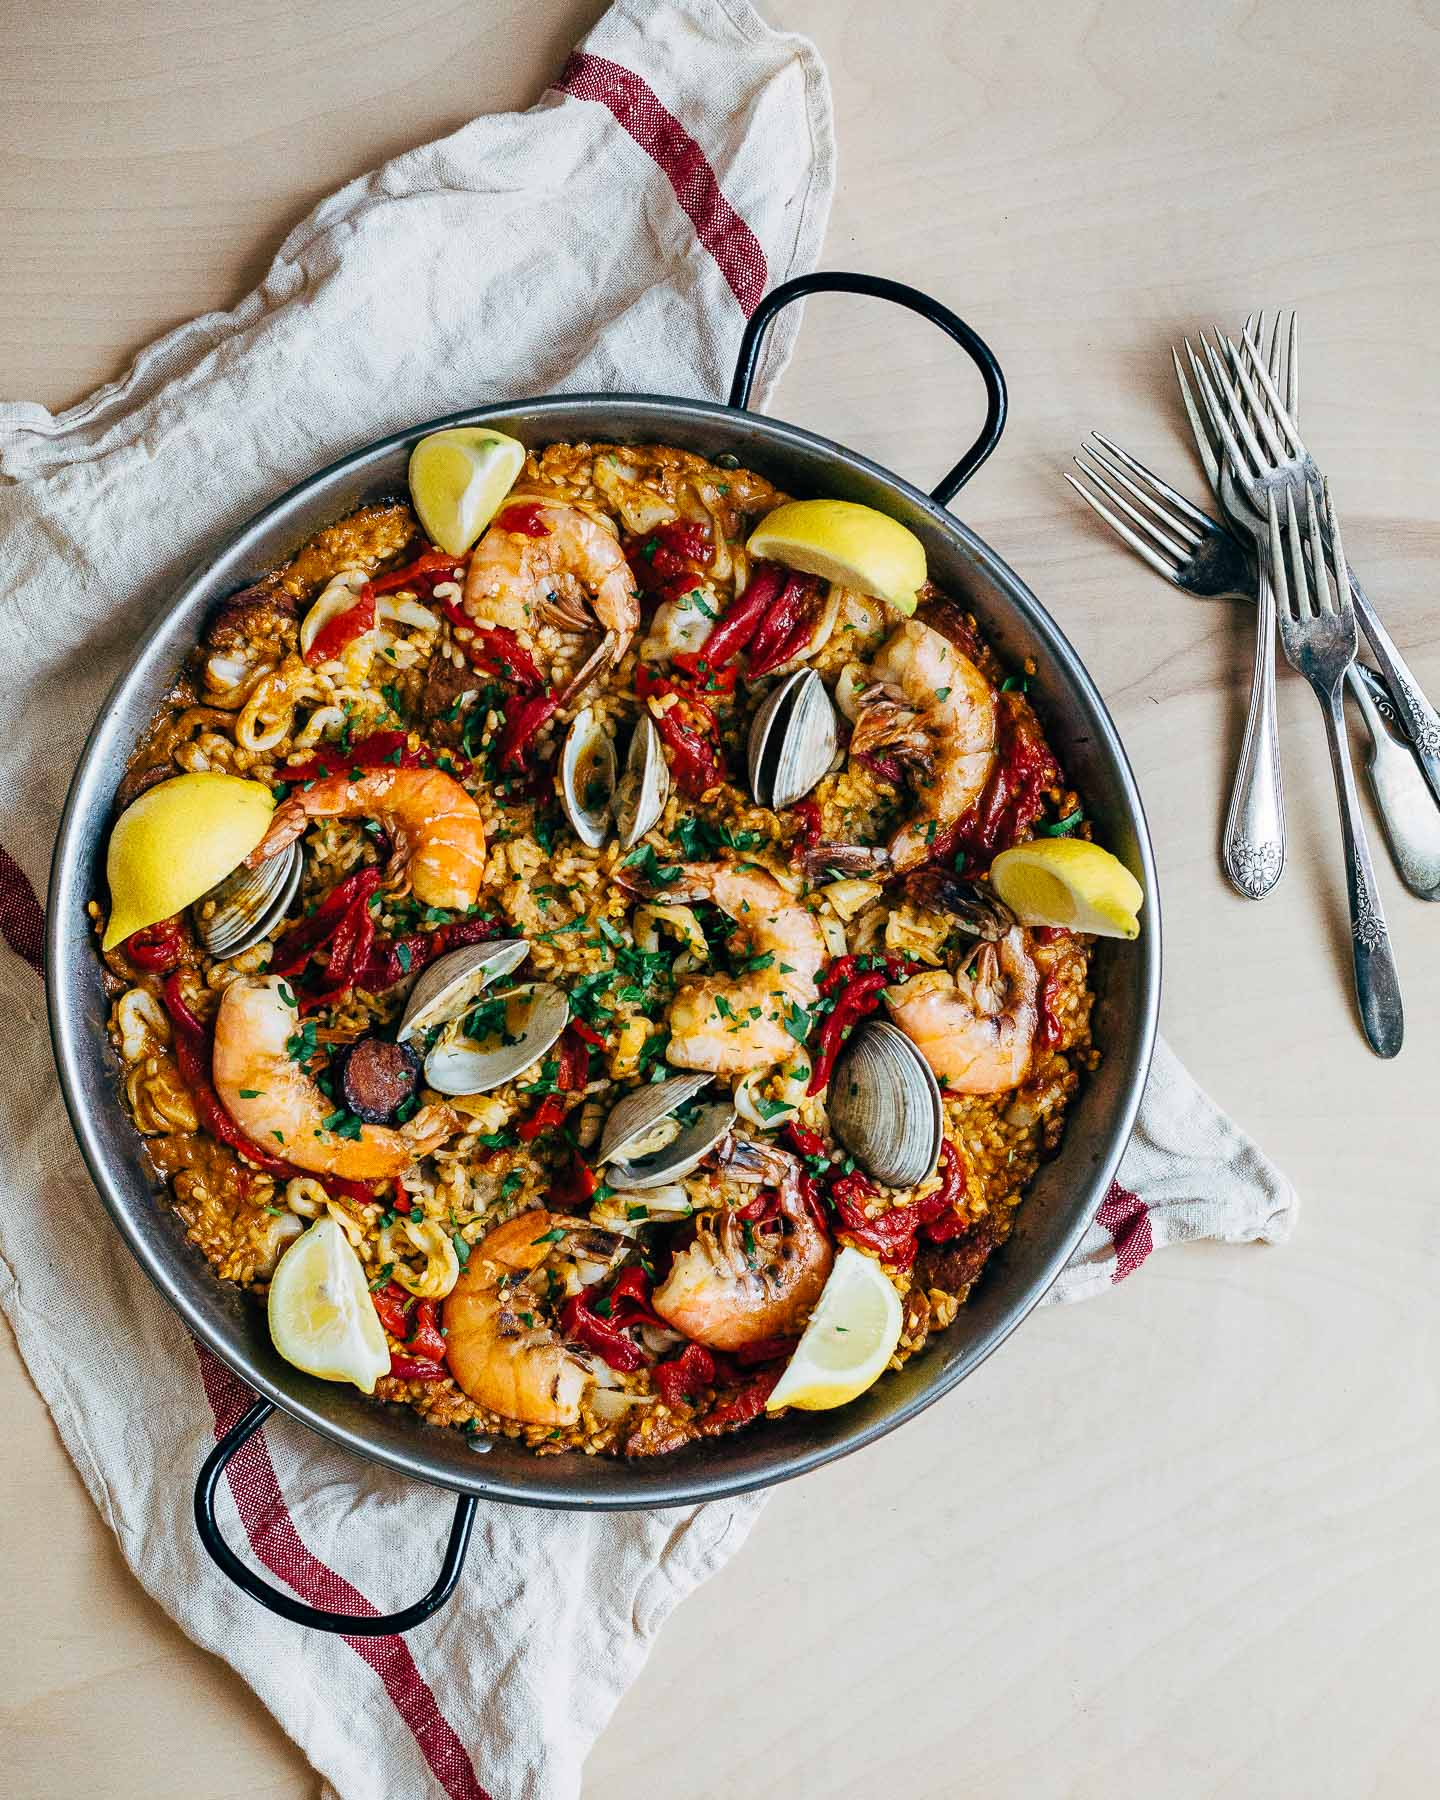 brooklynsupper http://brooklynsupper.com/2016/03/seafood-paella/